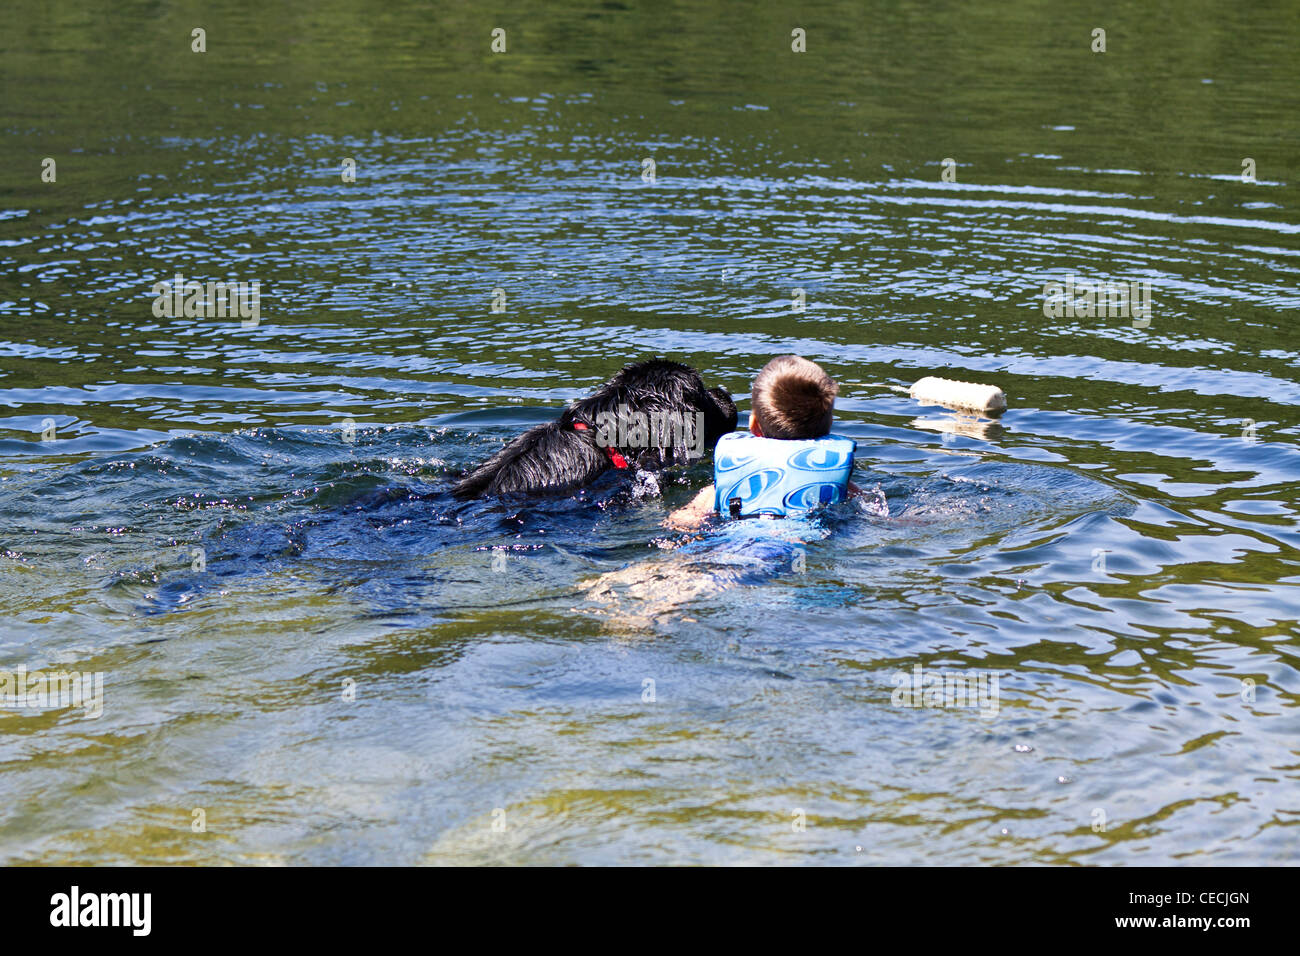 Child swimming with a Newfoundland dog. - Stock Image